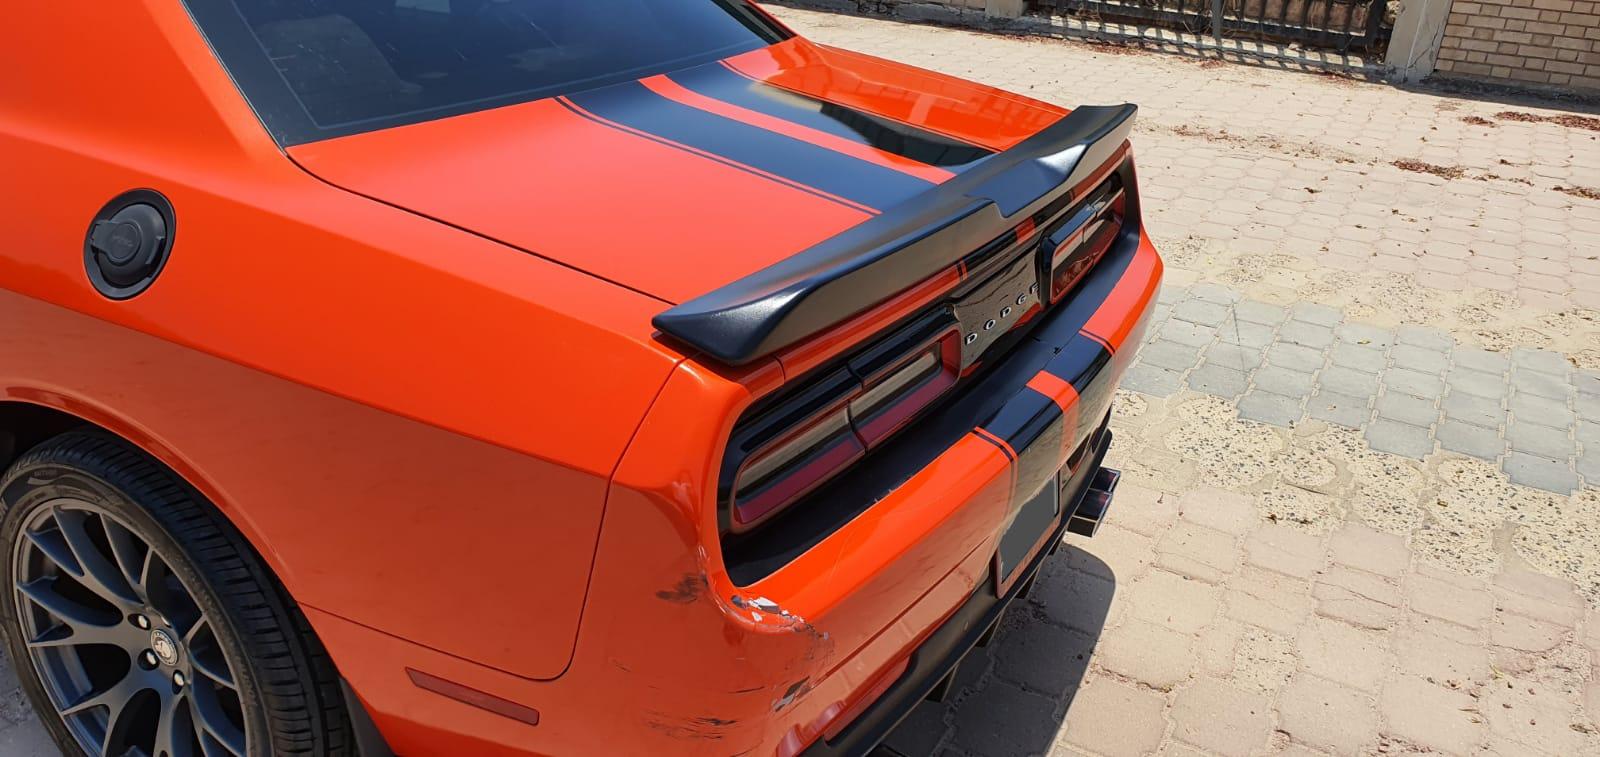 Dodge Challenger RT HEMI 2015